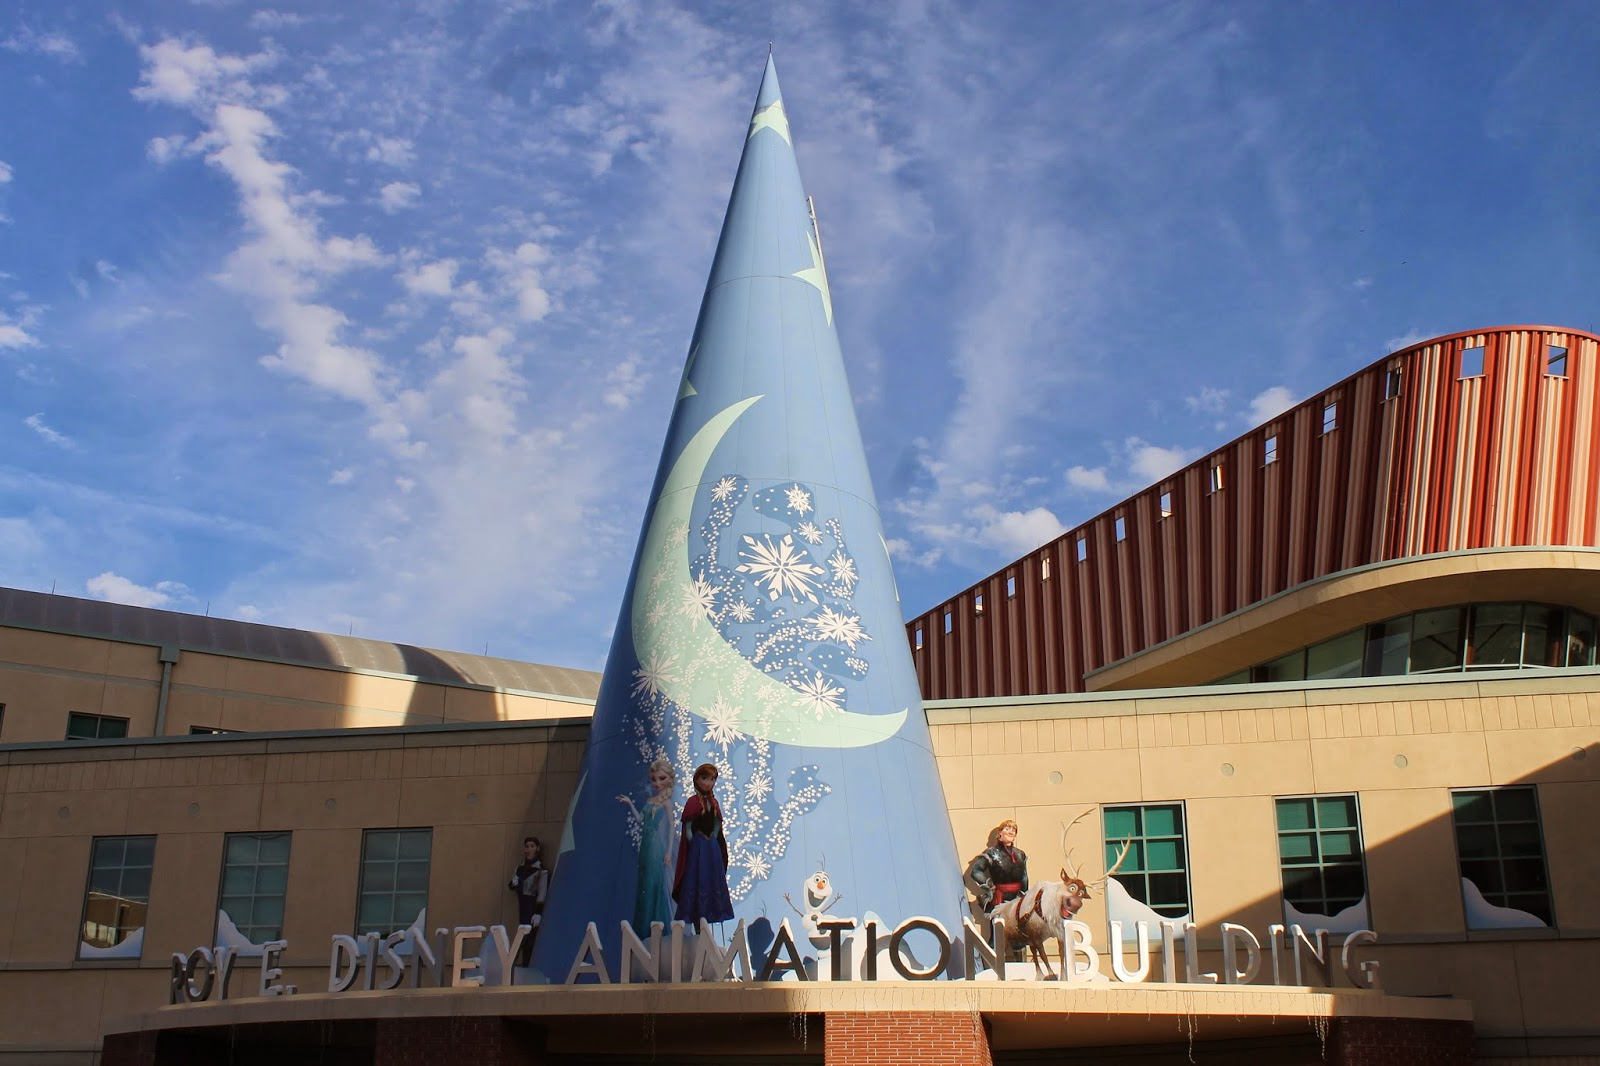 December 16 2013 Visting Walt Disney Animation Studios Castles